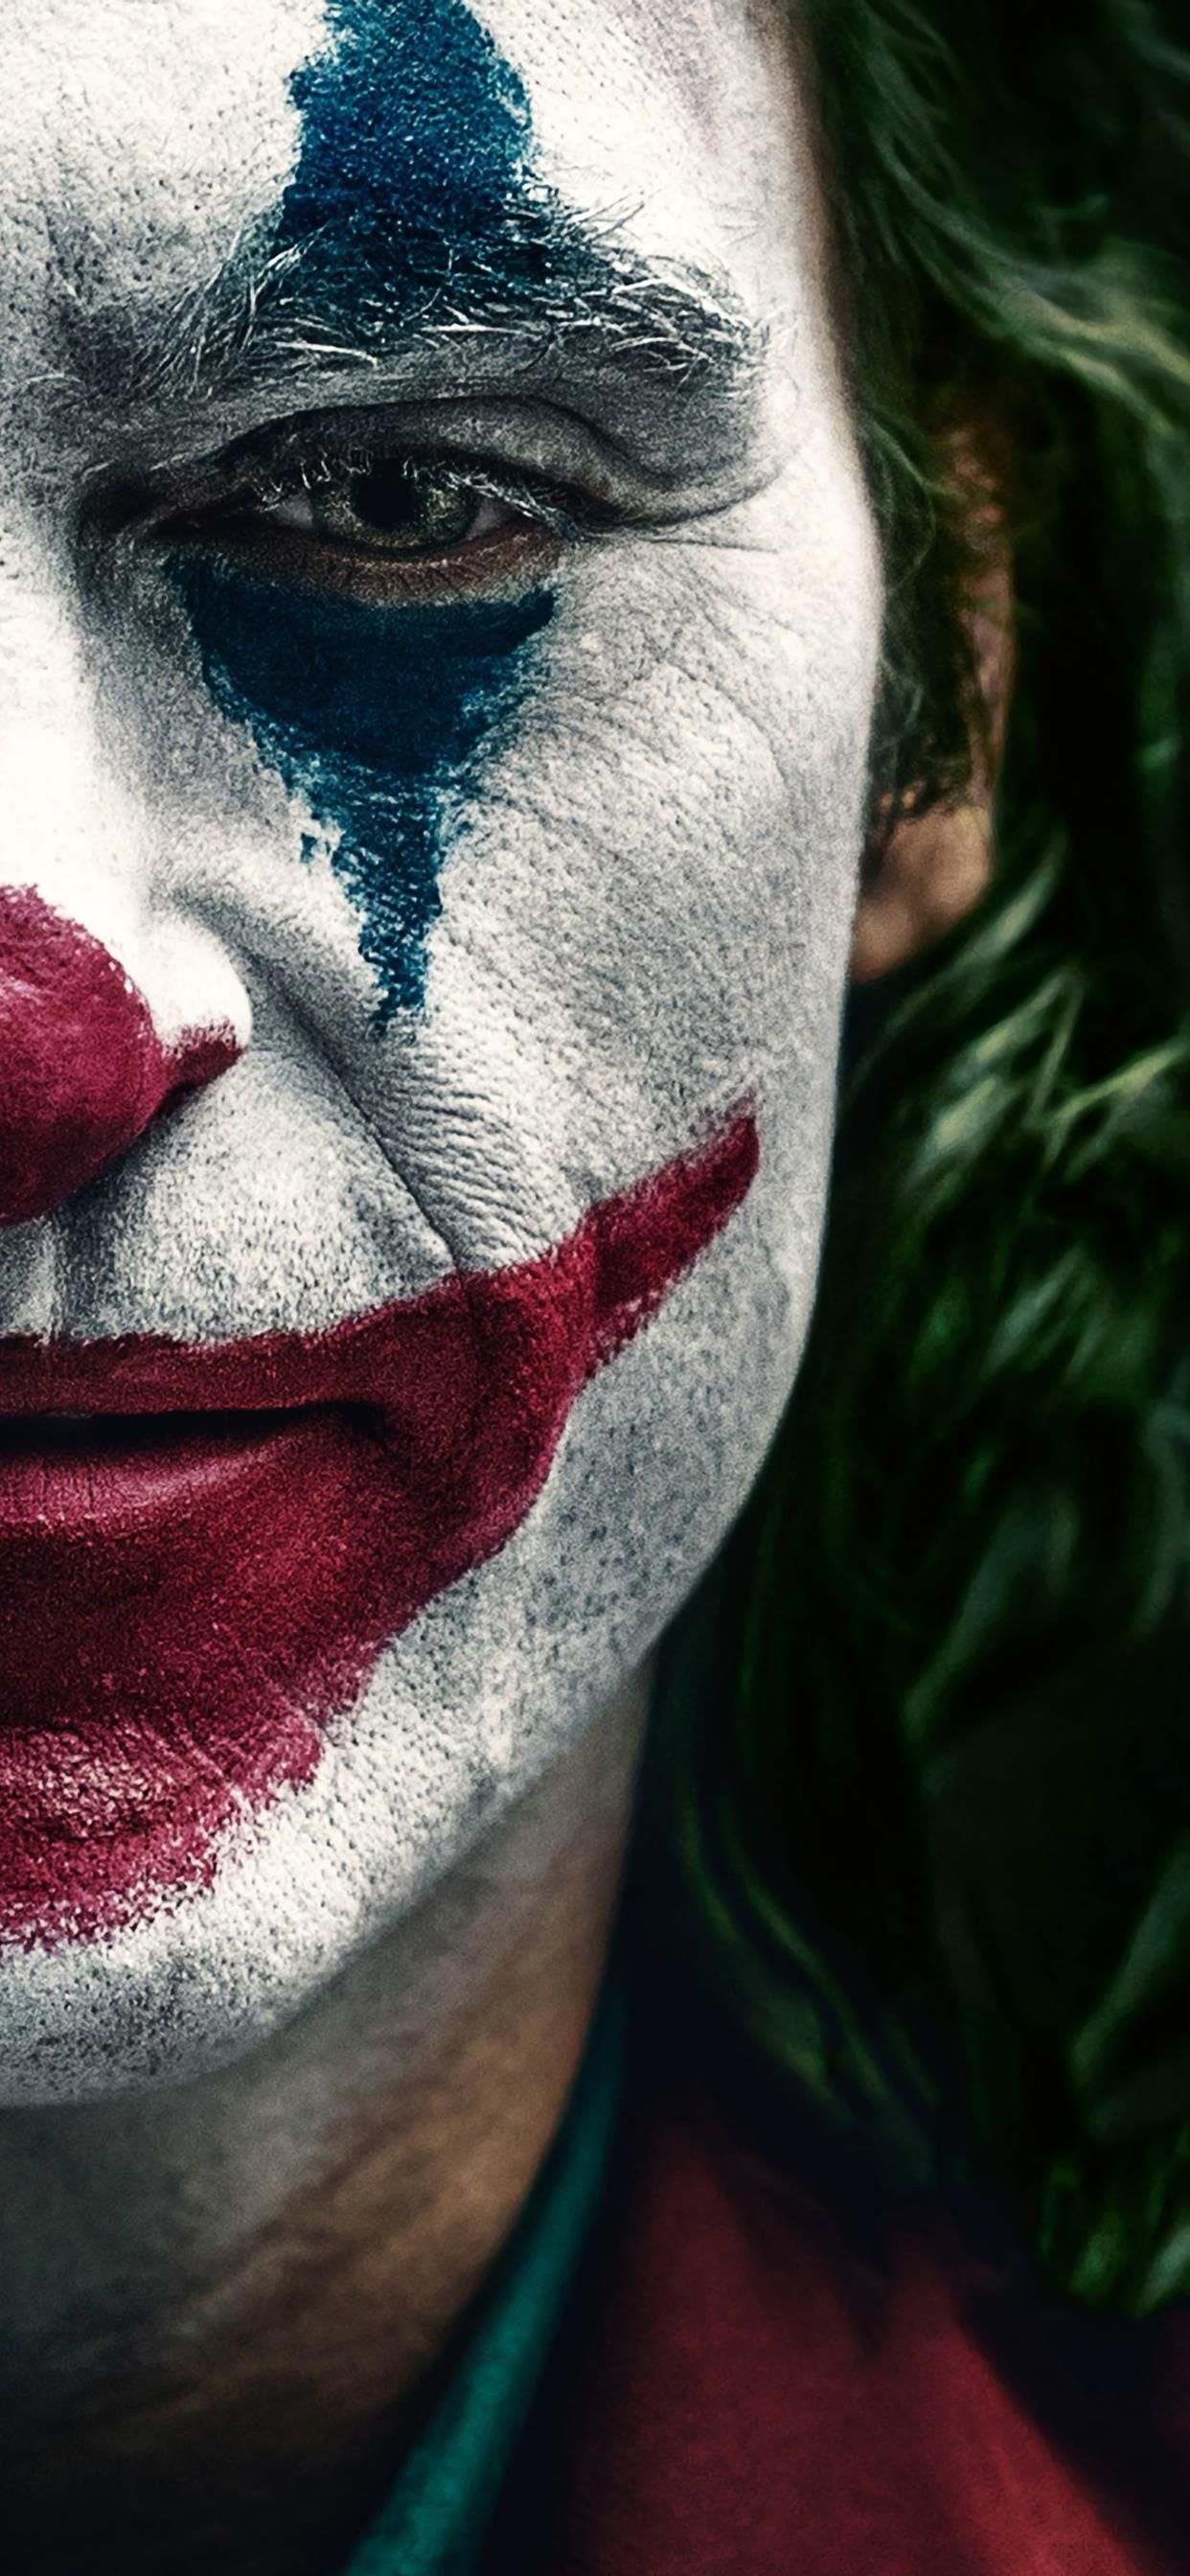 Joker 2019 Movie Iphone X Wallpapers Joker Hd Wallpaper Joker Wallpapers Joker Full Movie